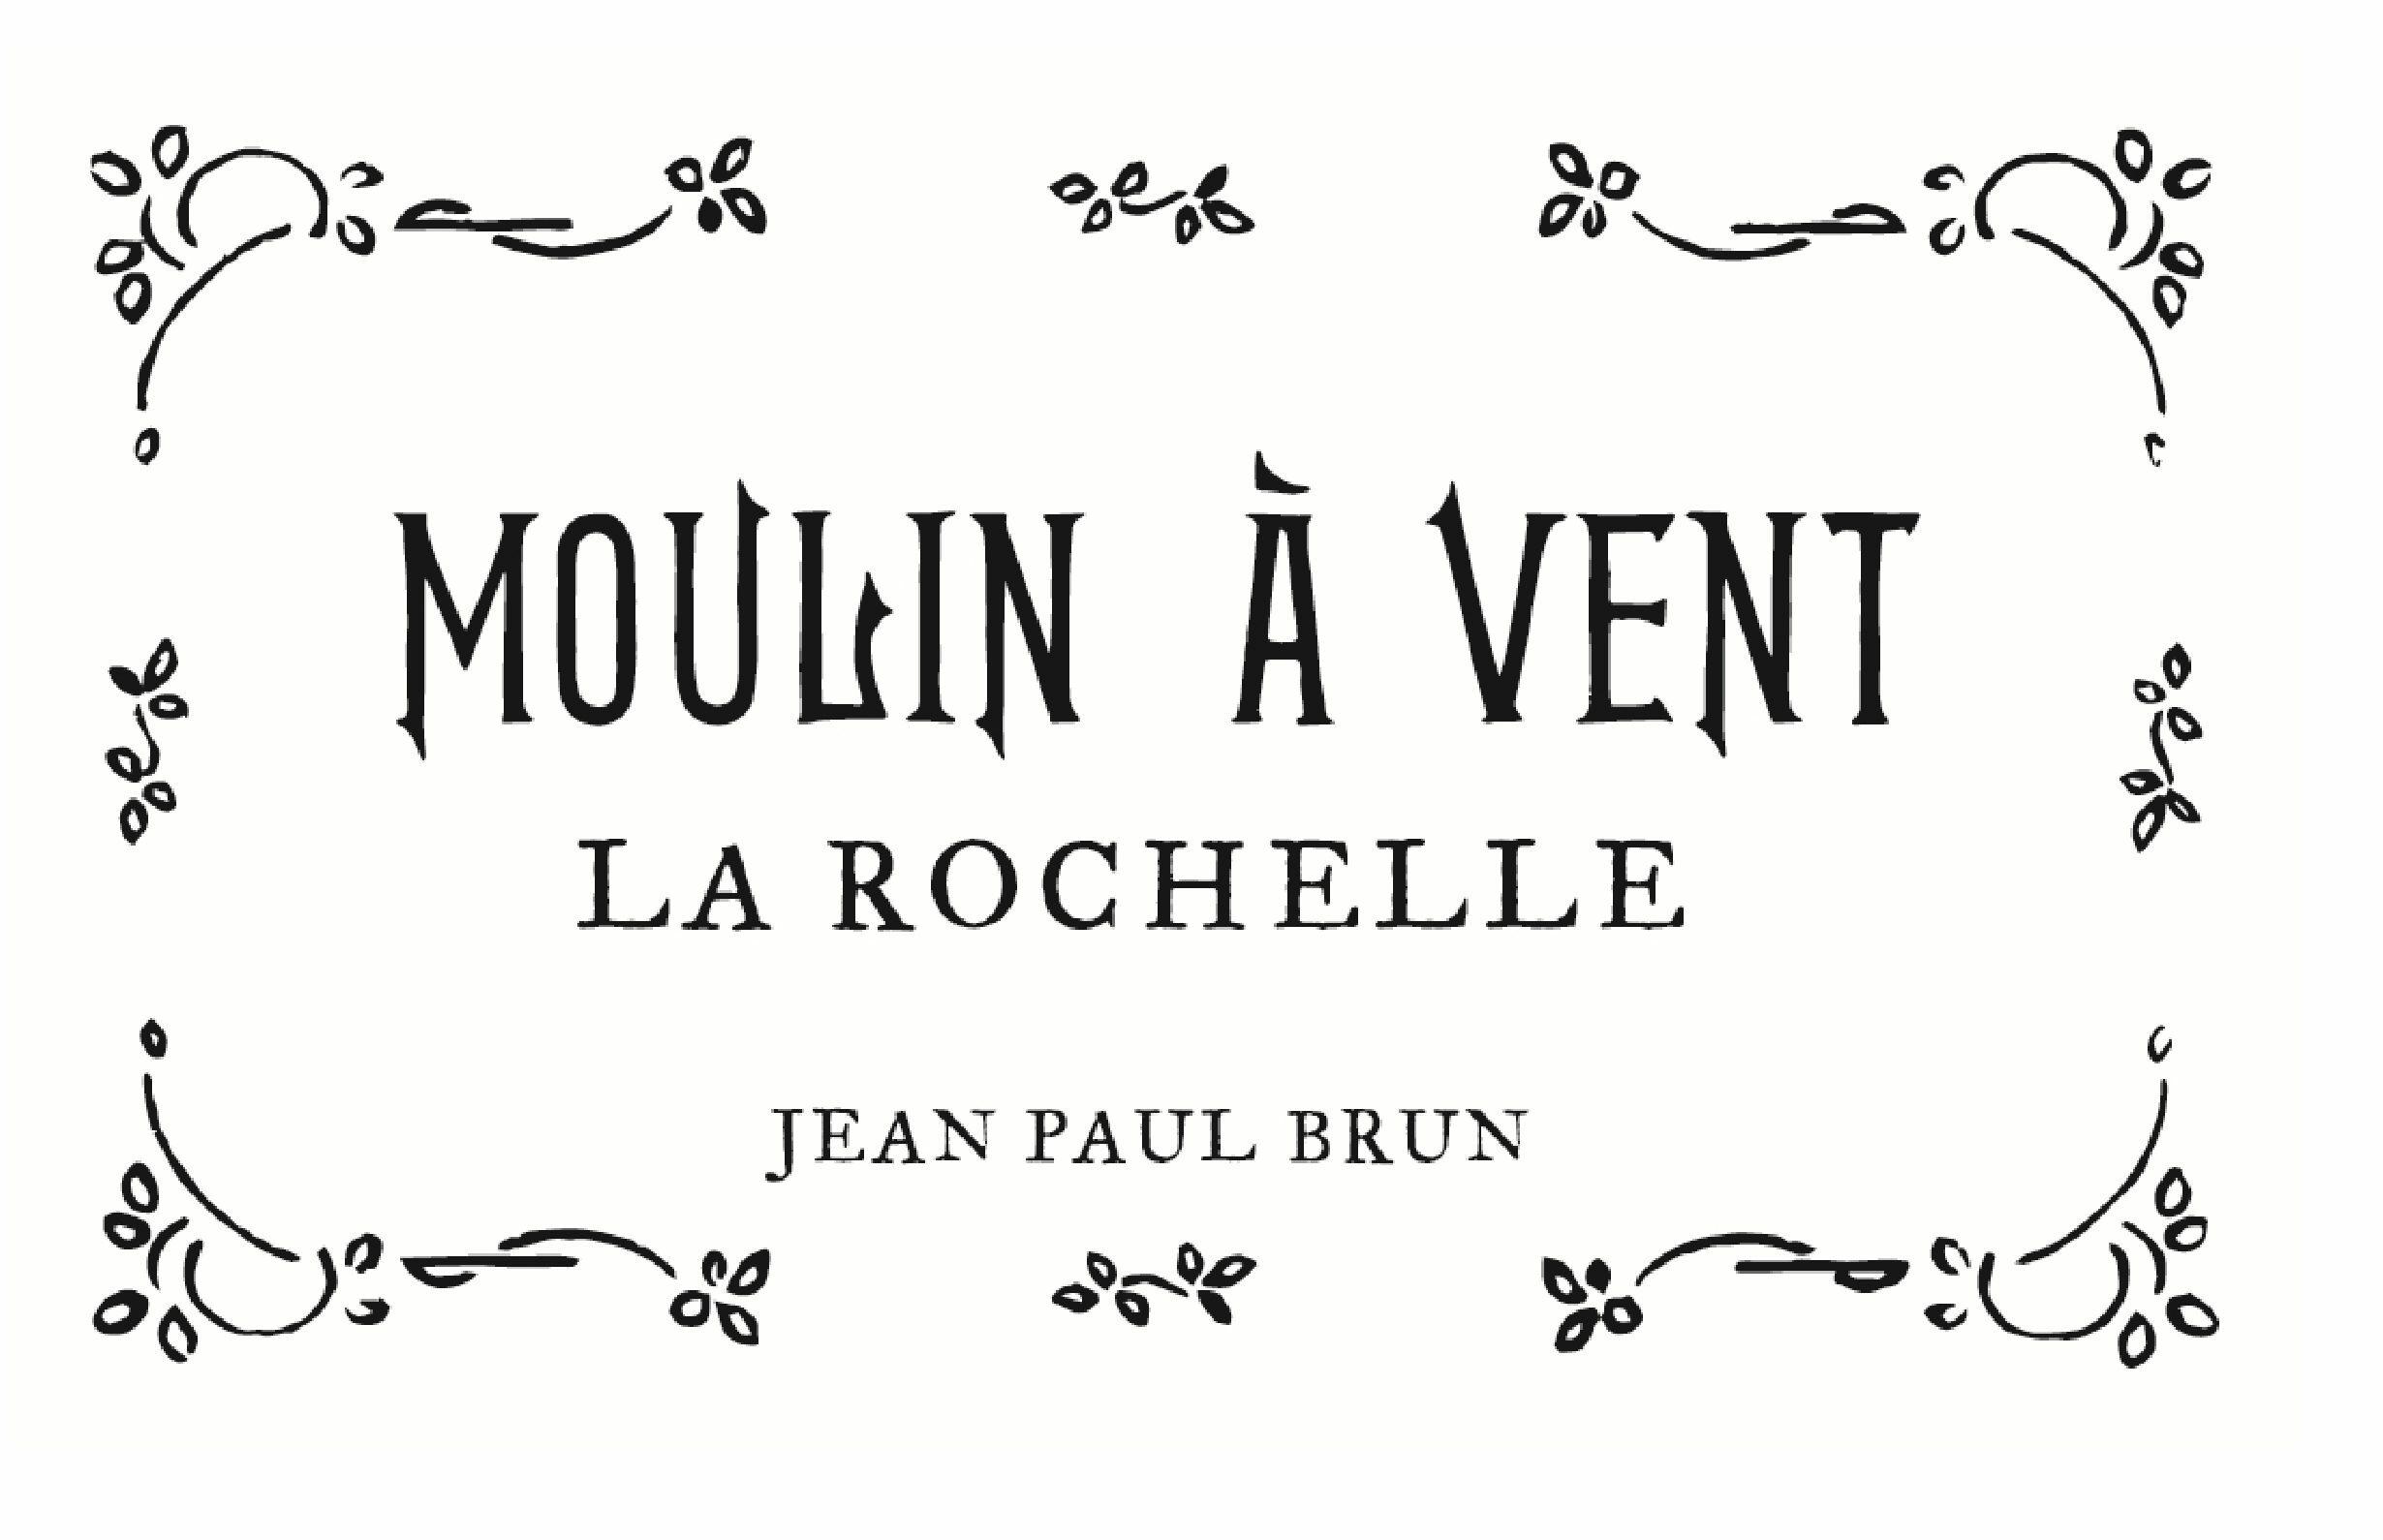 Moulin-a-Vent 'La Rochelle' Jean Paul Brun Terres Dorees 2015 00184